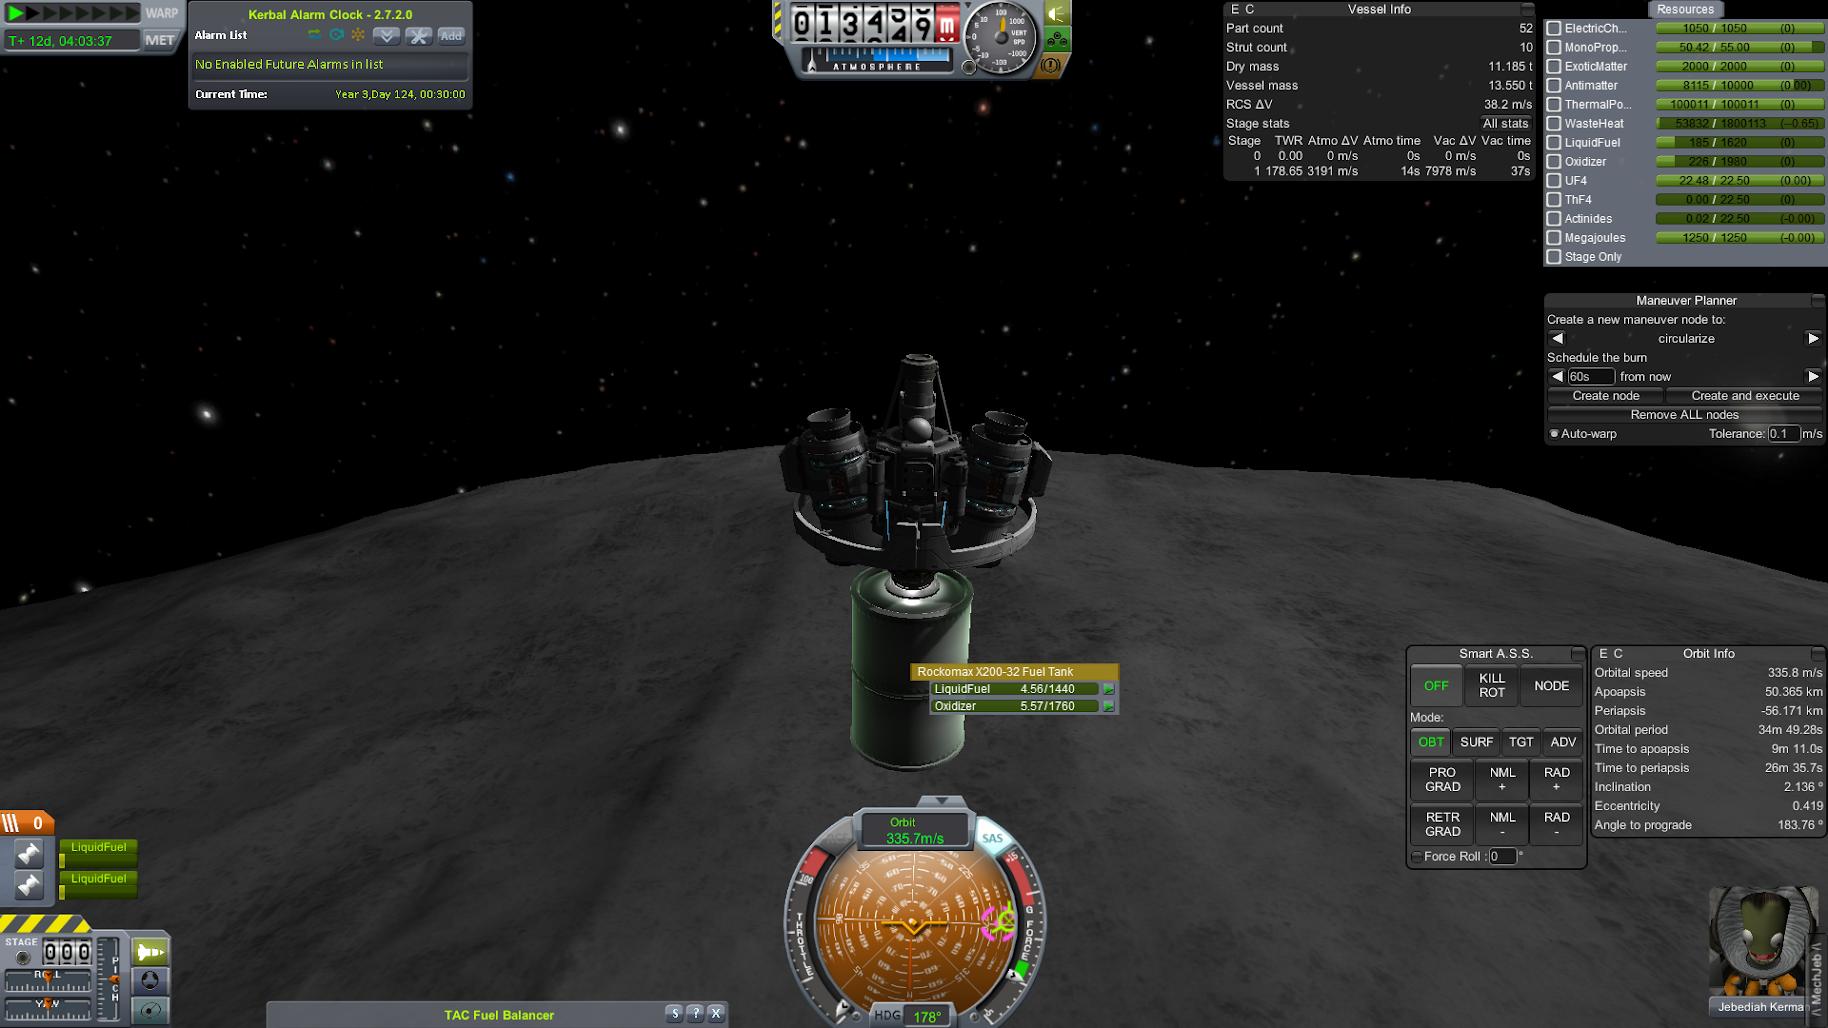 screenshot74.png